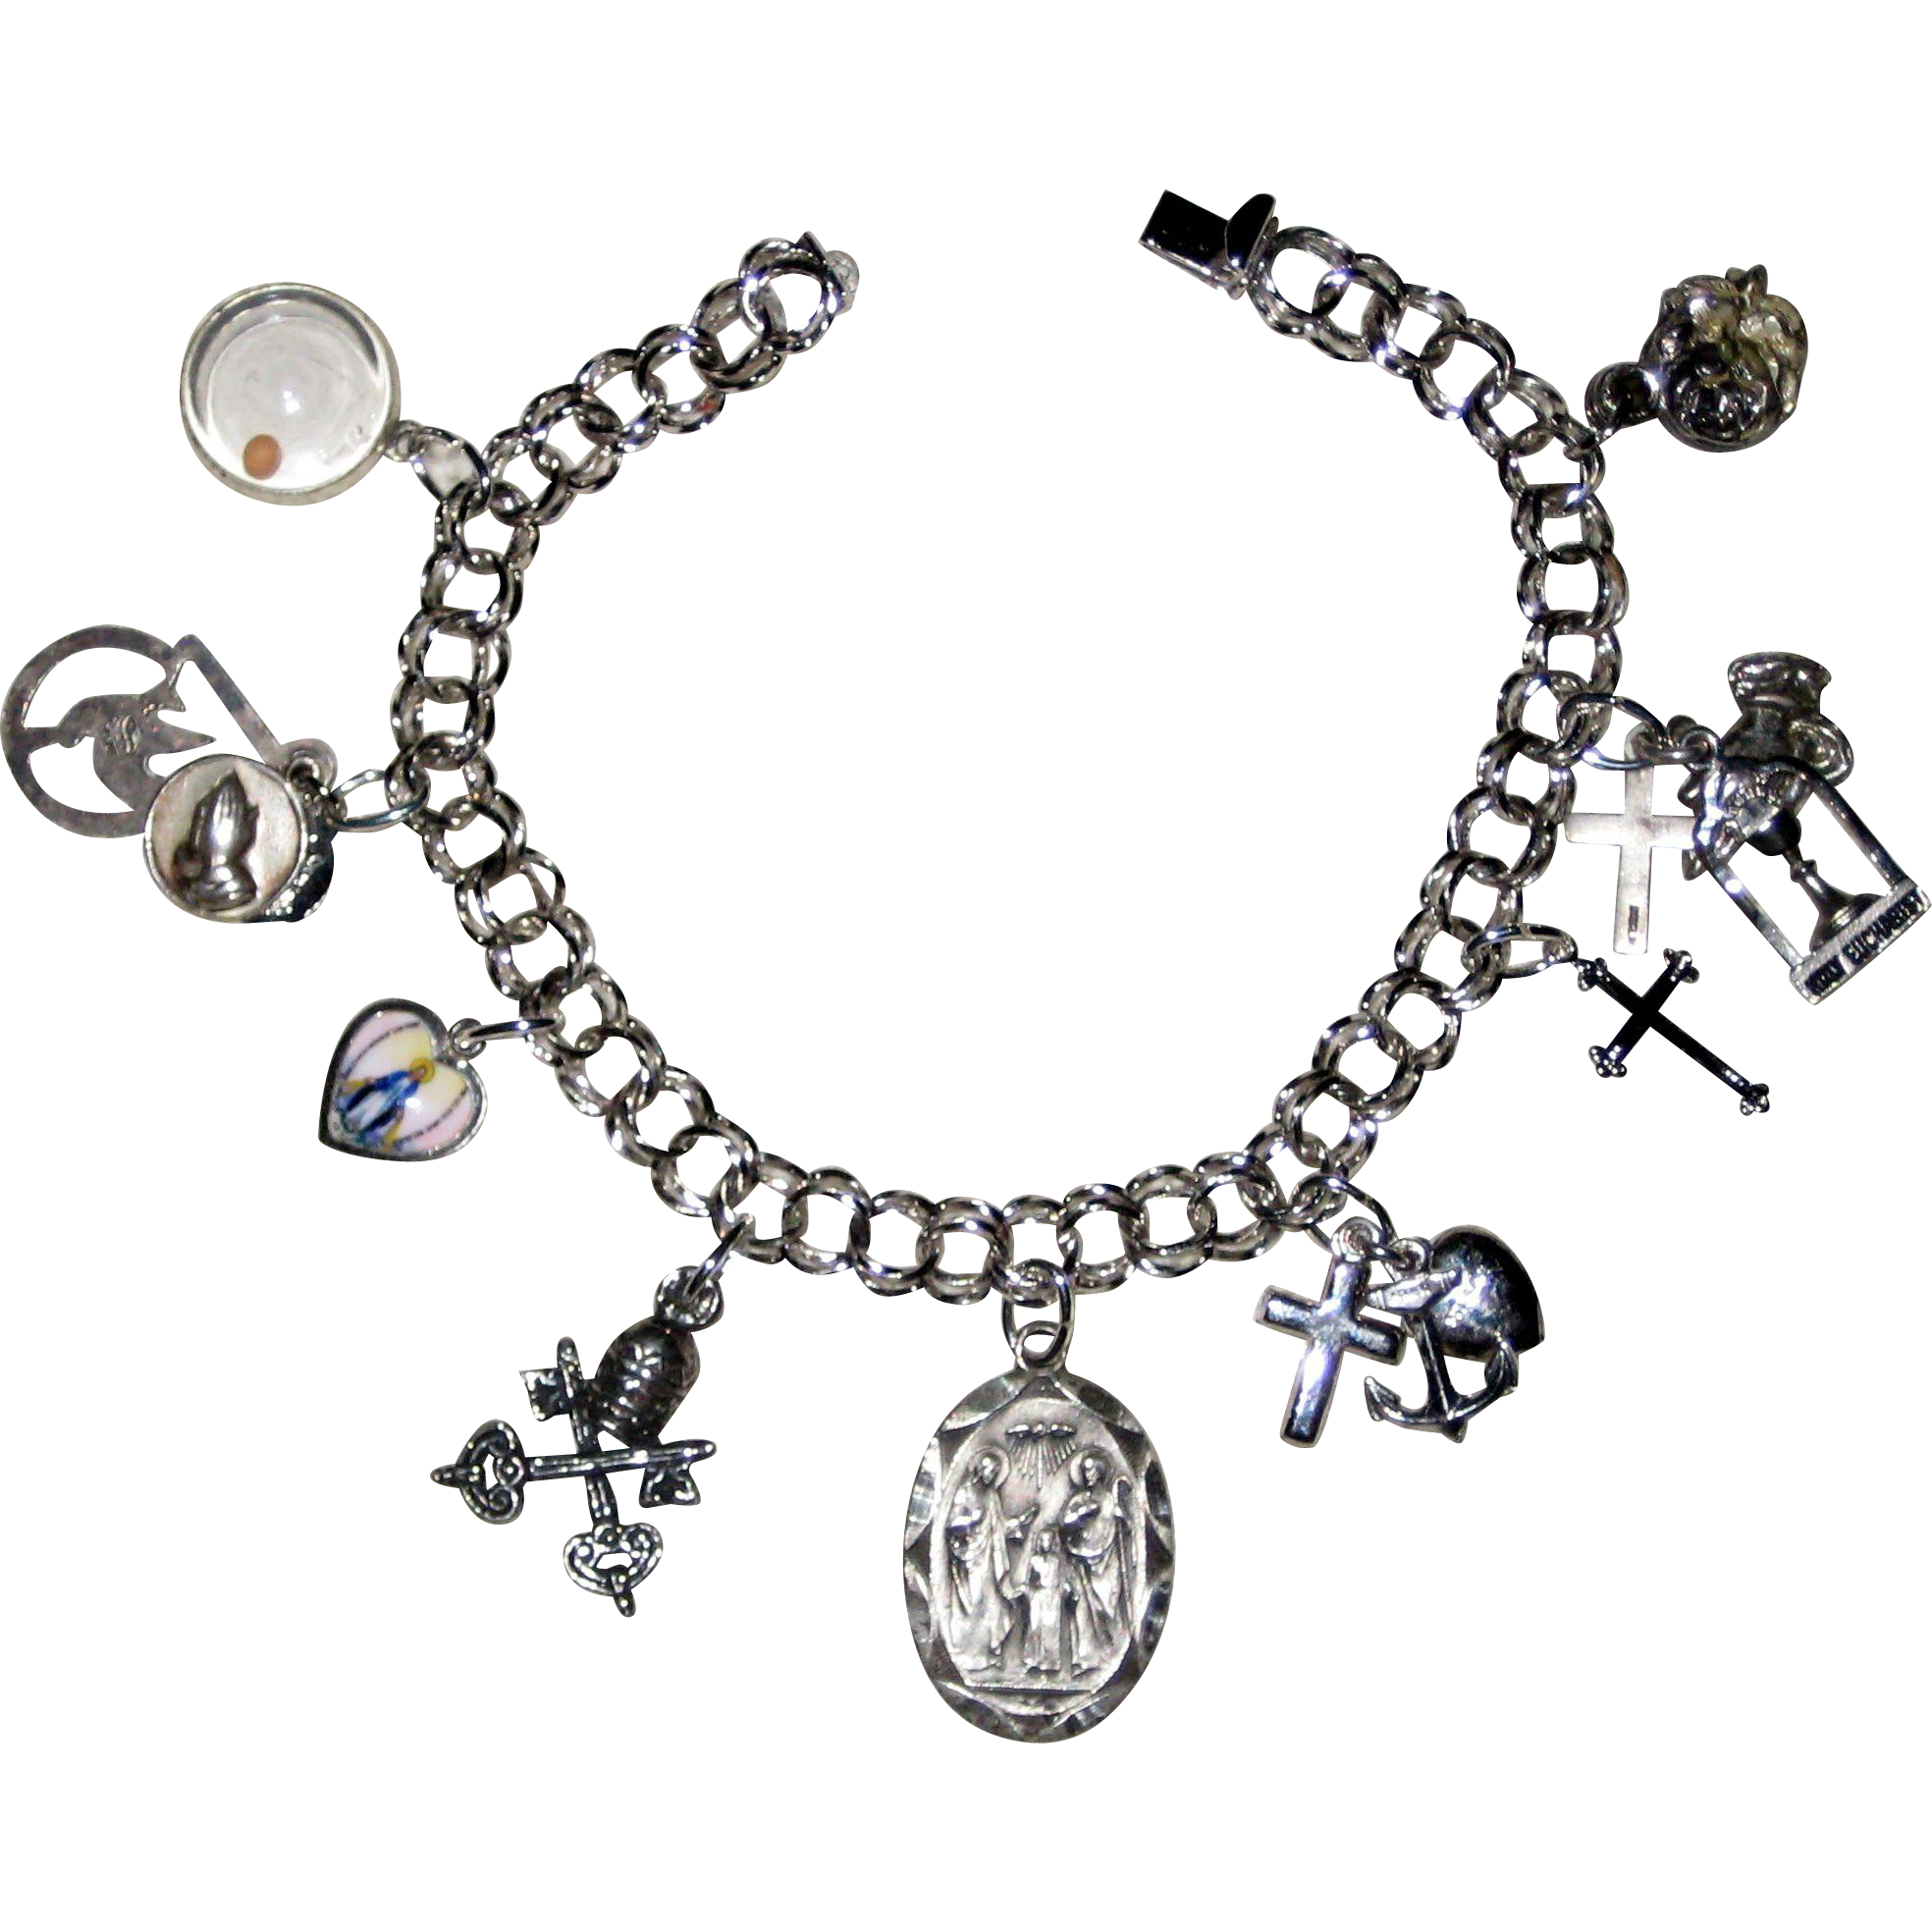 Christian Charm Bracelets: All Sterling Religious Catholic Charm Bracelet With